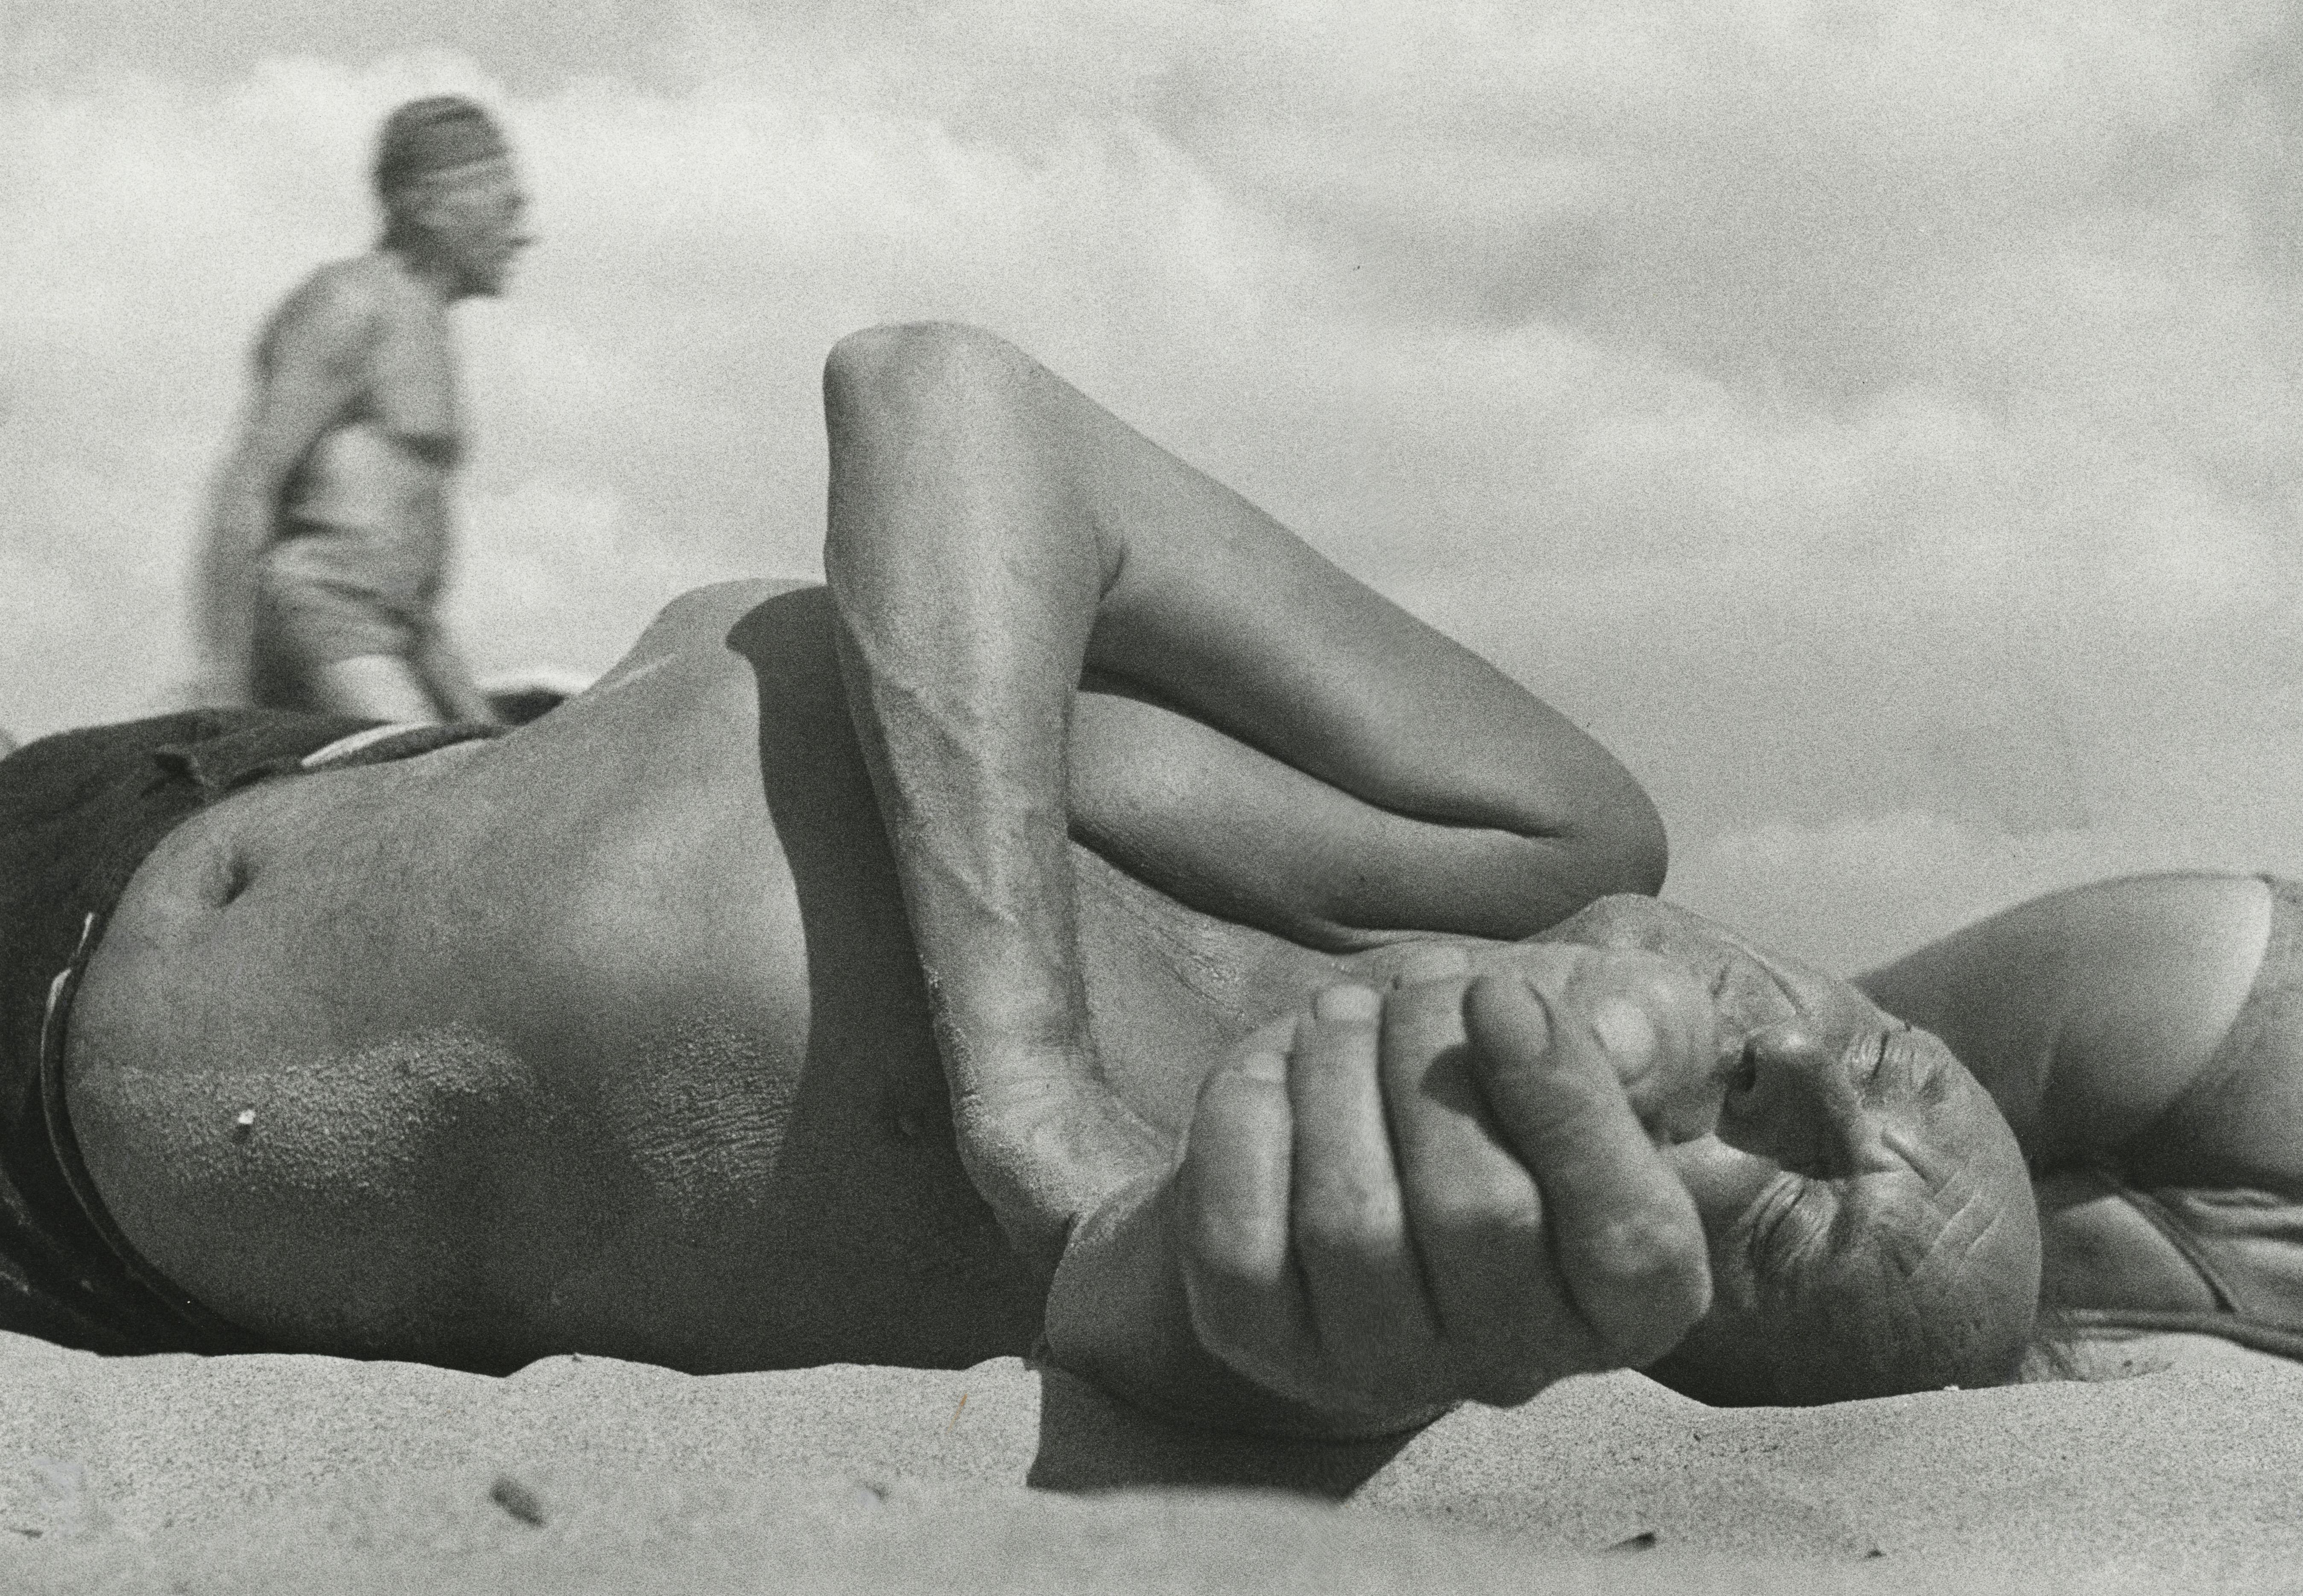 5-Leo Levinstein _Coney Island 1954_